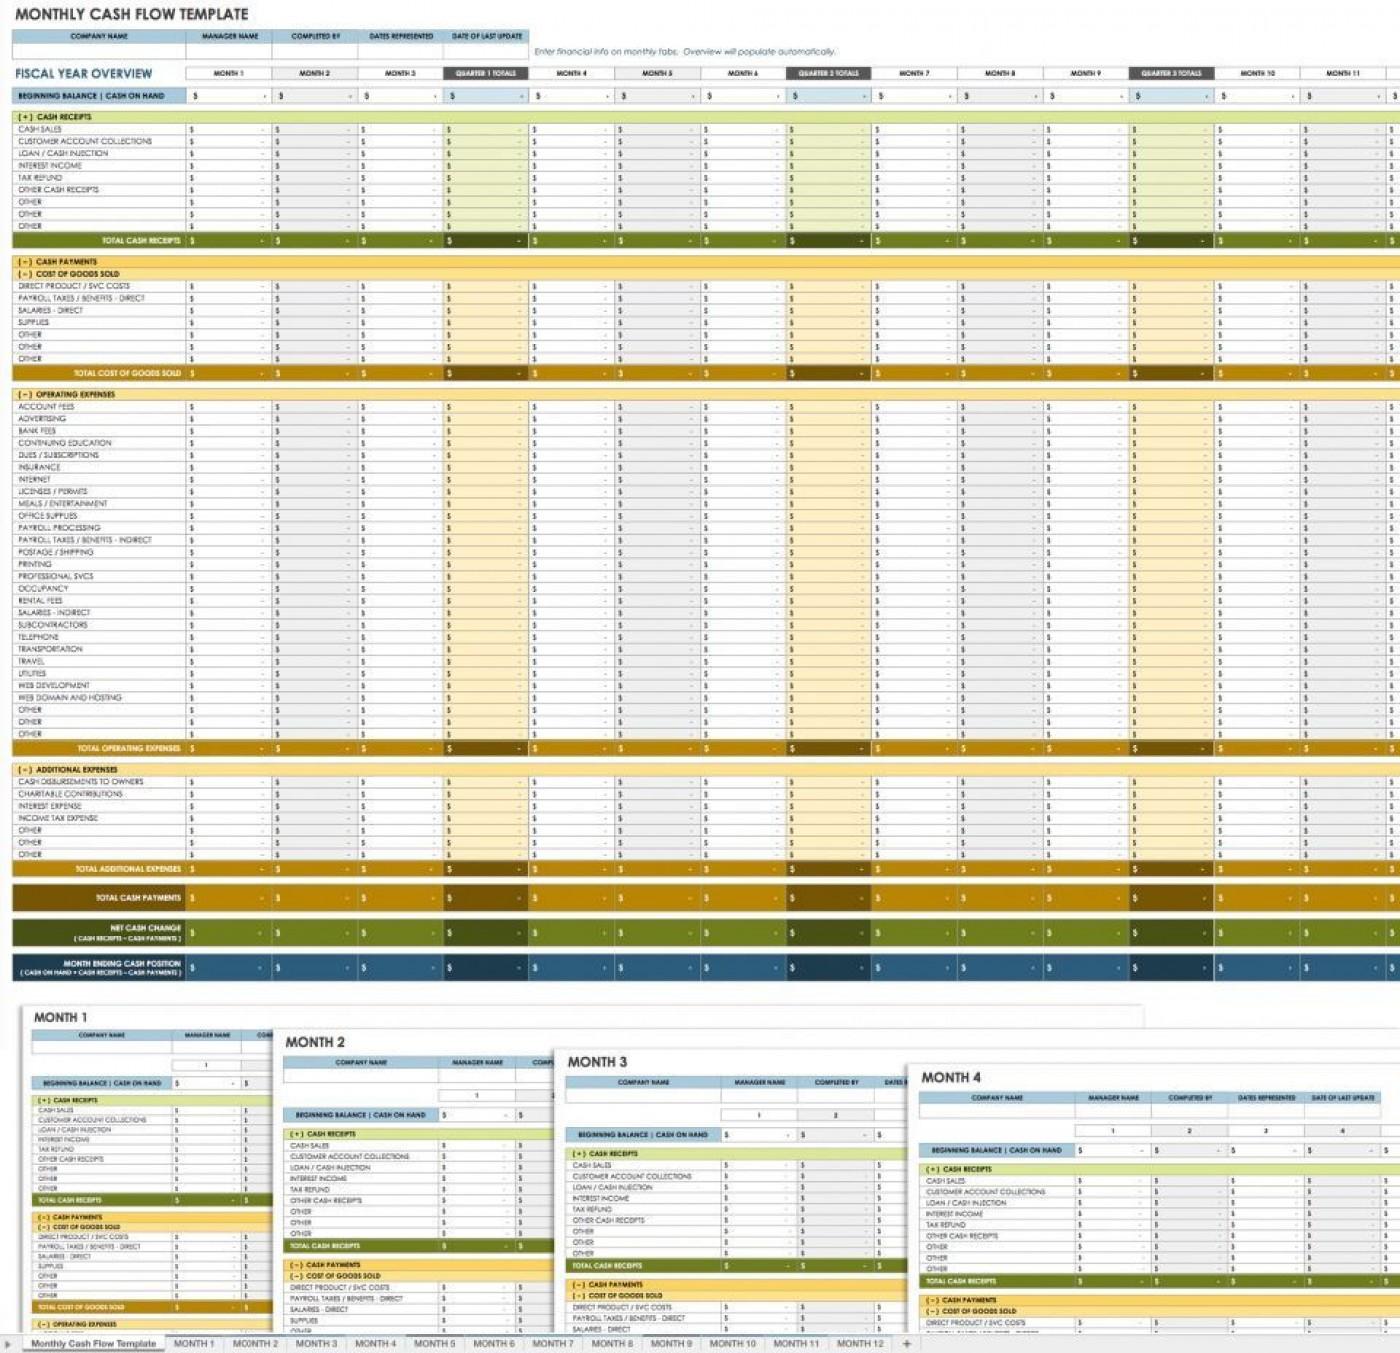 007 Frightening Cash Flow Template Excel Free High Def  Statement Download Format In1400